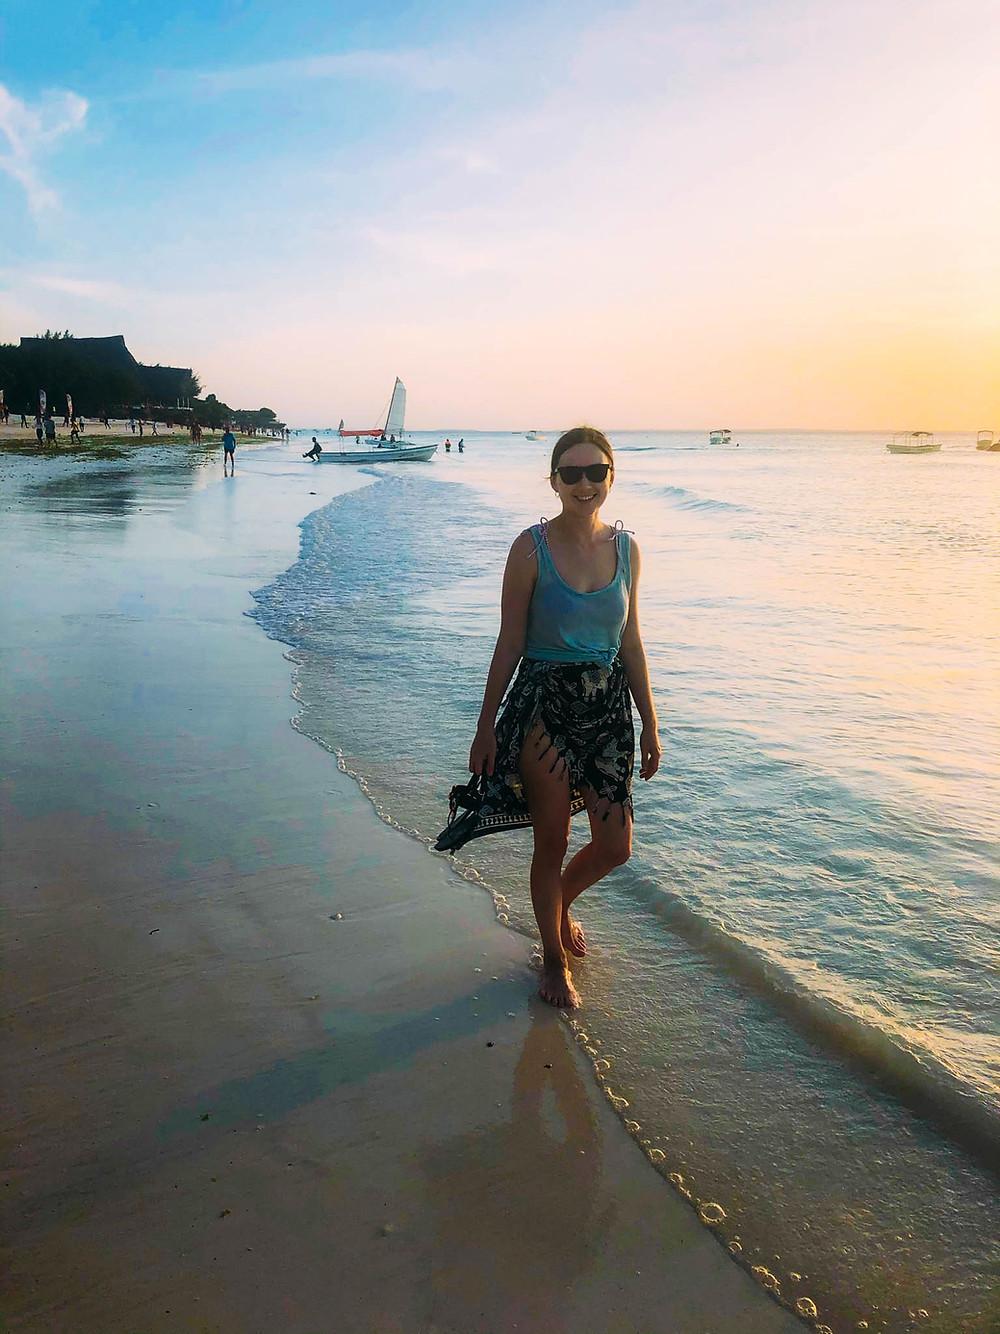 Evening strolls along Nungwi's beaches